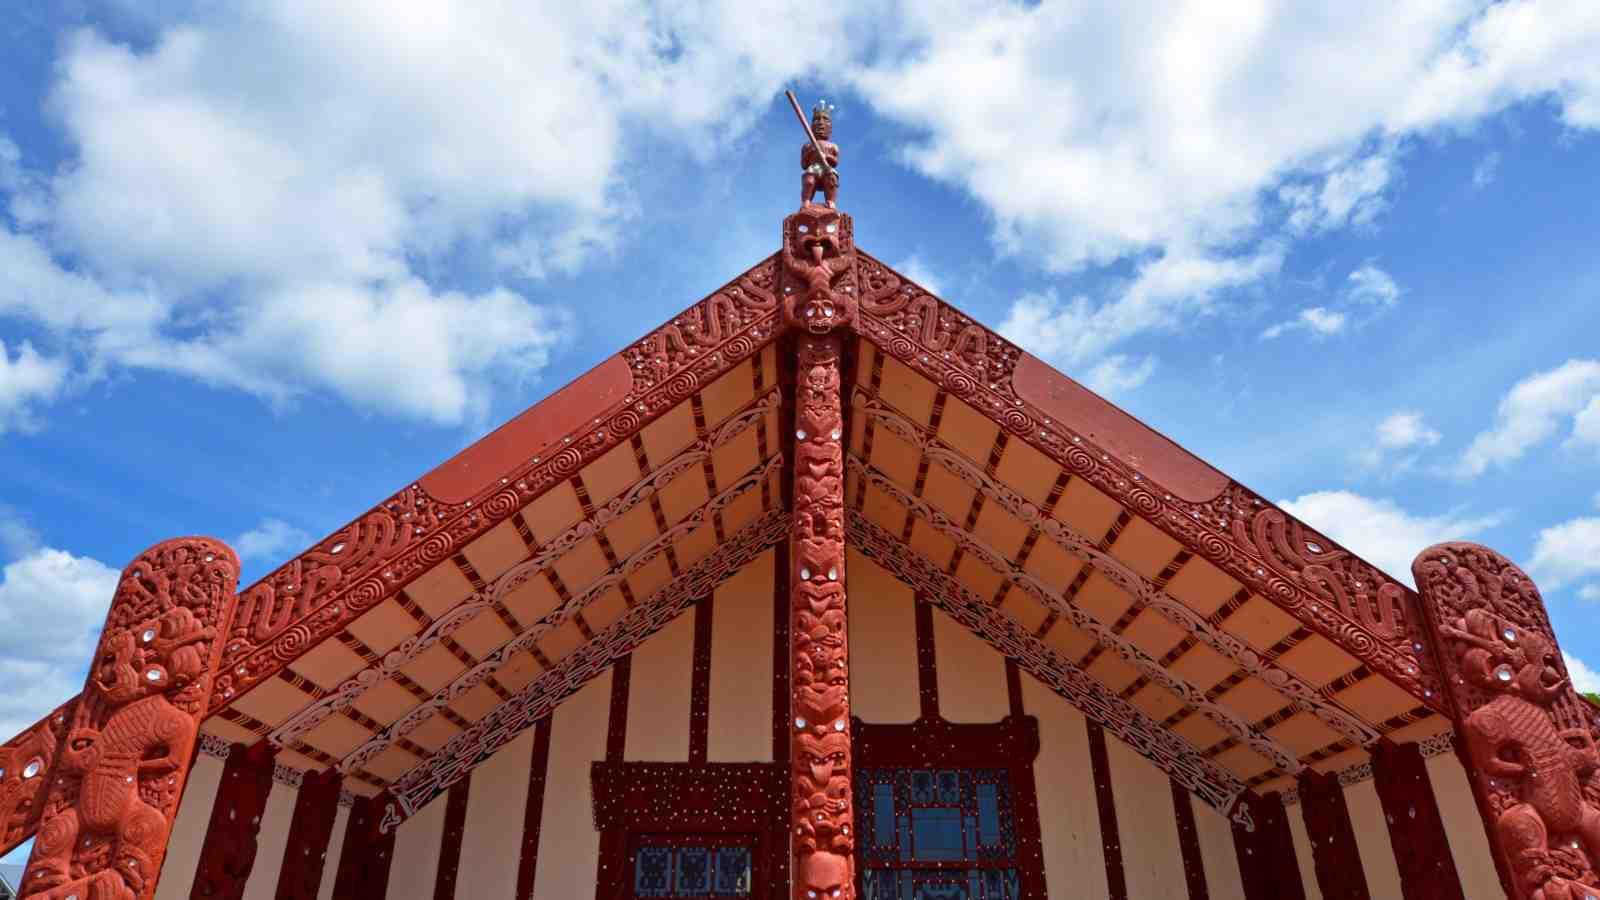 A Māori 'Marae' meeting house